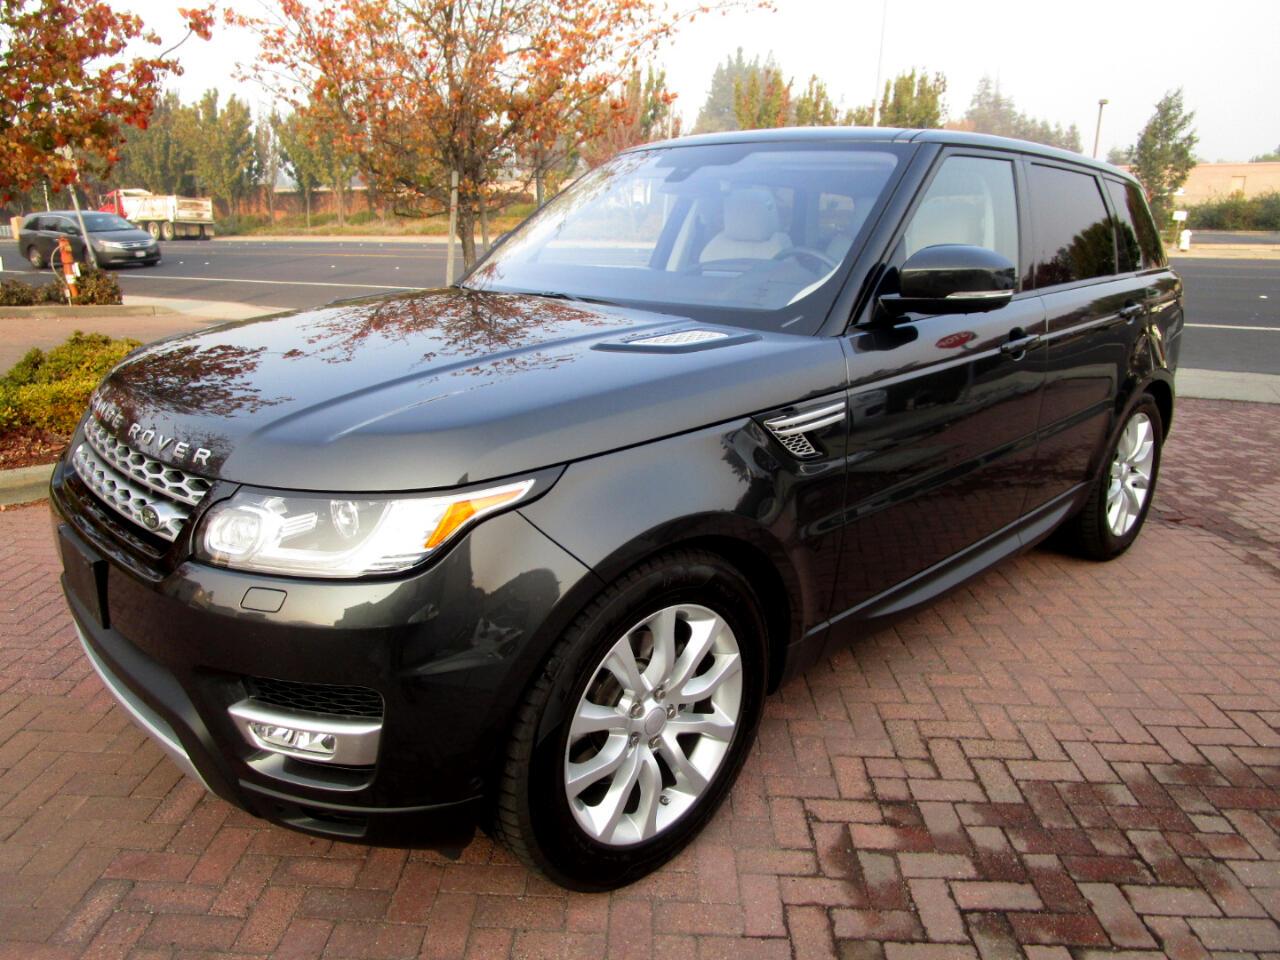 2016 Land Rover Range Rover Sport HSE*PANO*HEAT/AC SEATS*REAR HEAT SEATS*HEAT STR WH